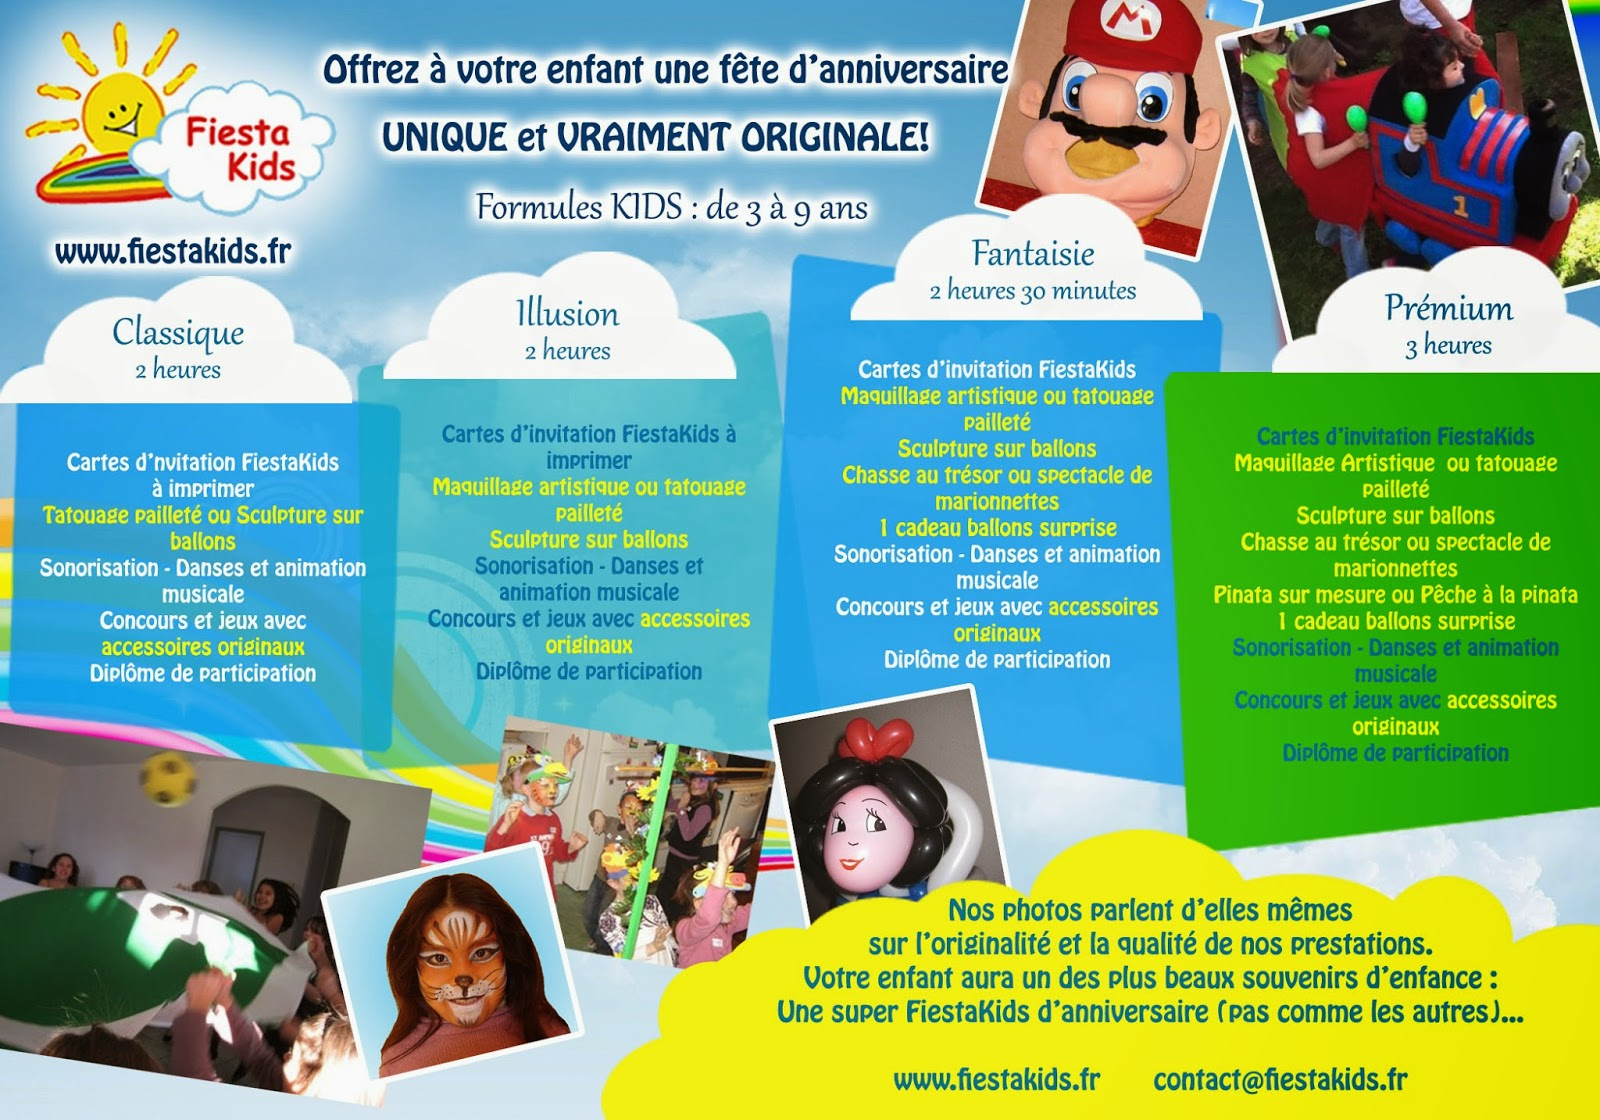 fiestakids animations et spectacles pour enfants toulouse ari ge carcassonne animation. Black Bedroom Furniture Sets. Home Design Ideas